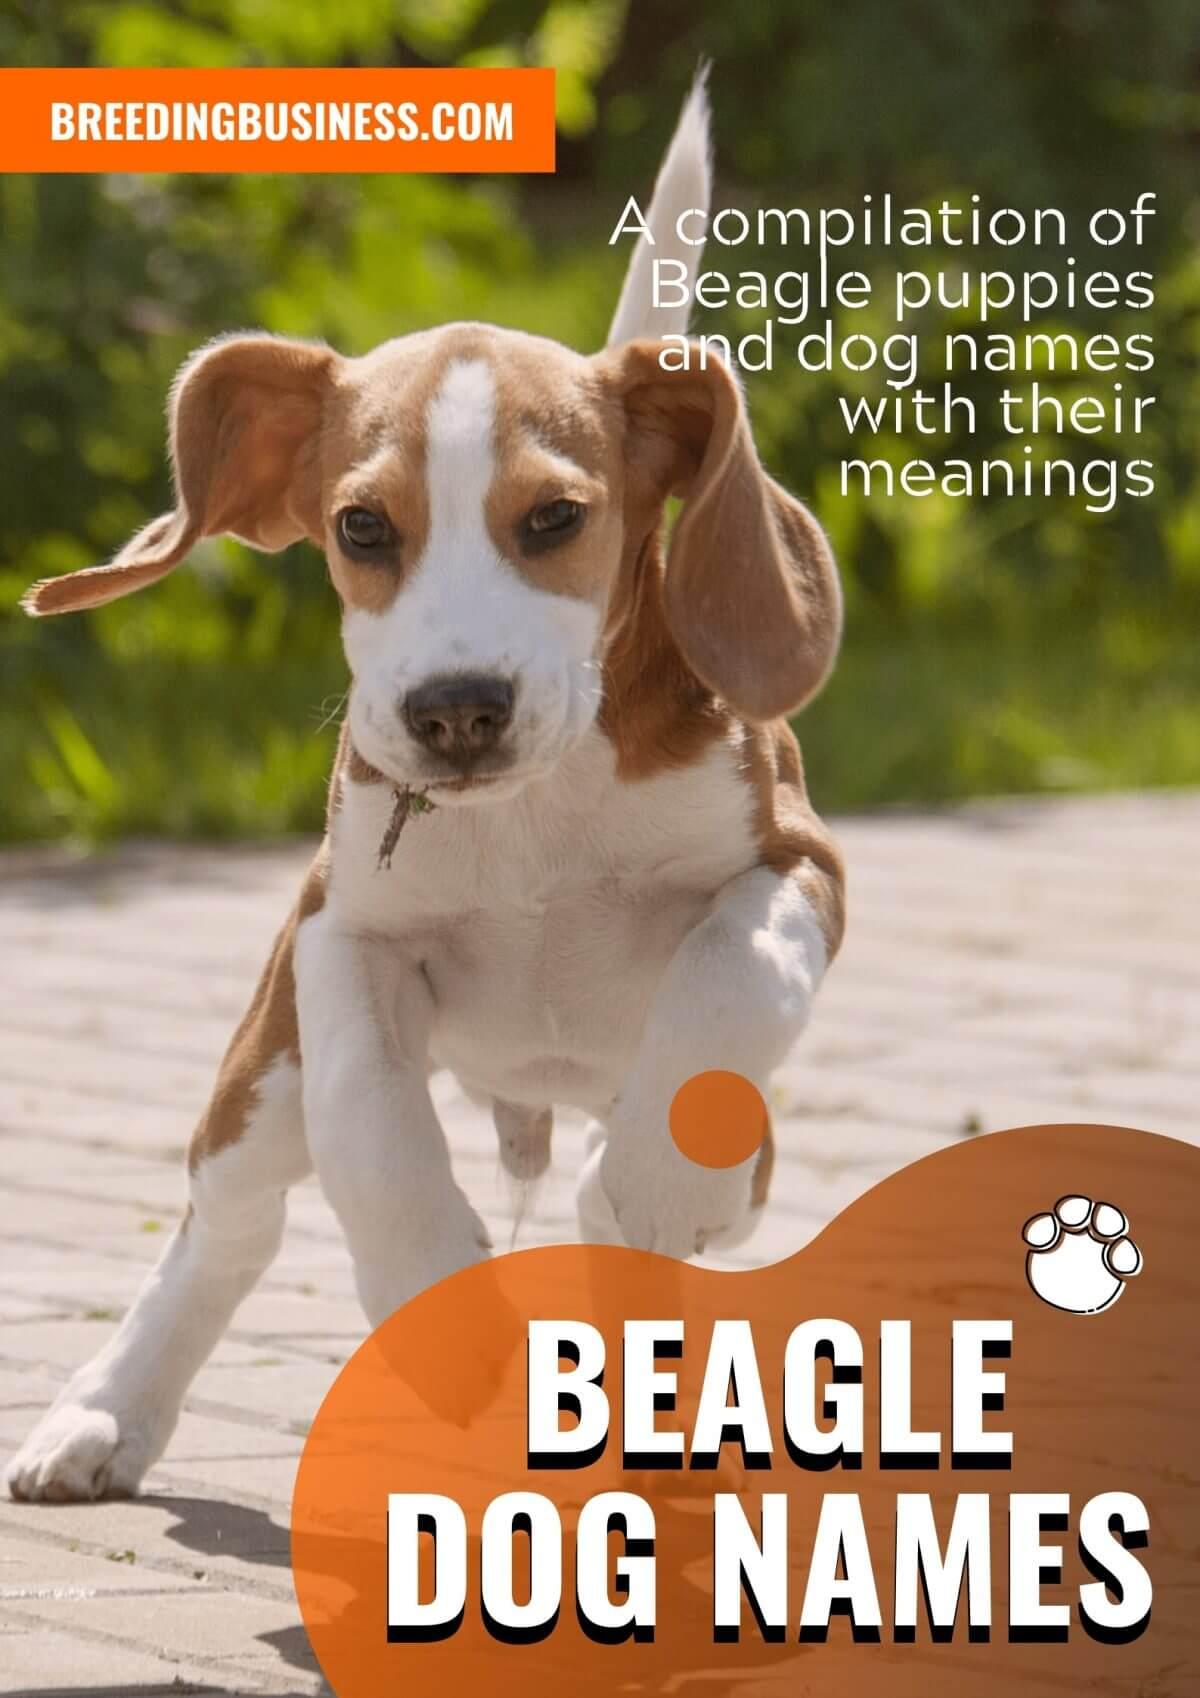 The best Beagle dog names!